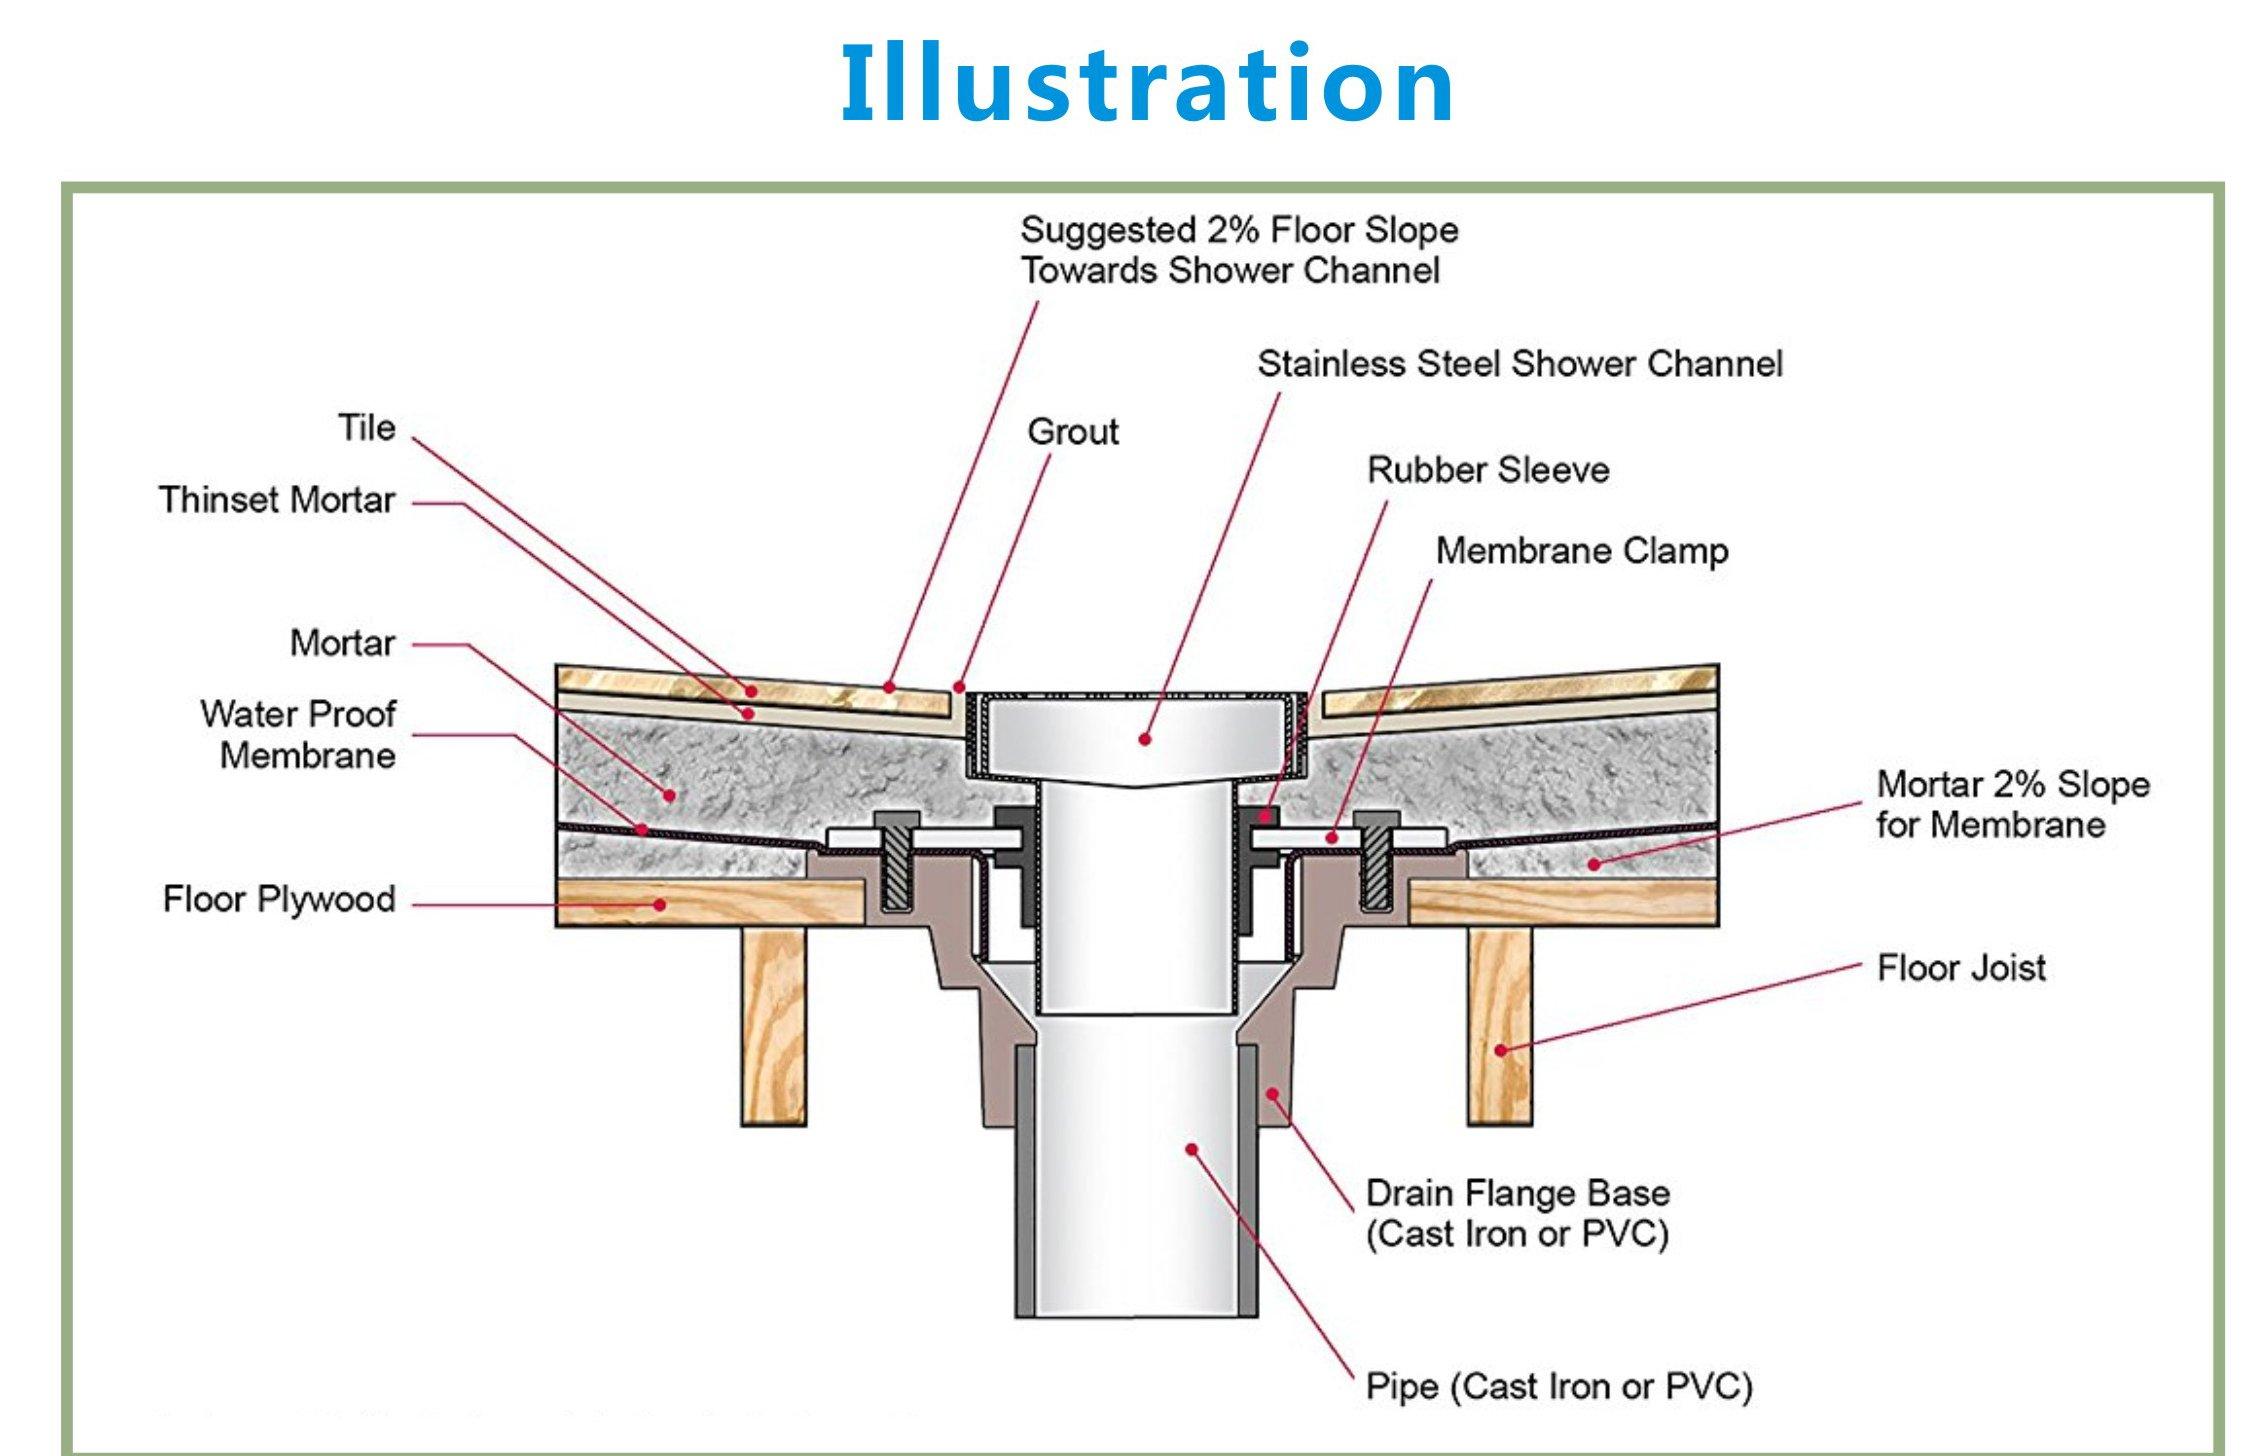 Pofuzen Linear Shower Drain Base (flange) with Rubber Gasket. Linear drain kit, ABS Base, PVC Flange - Ideal for Tile Insert Floor Drains - Compatible with 36 inch and 48 inch Linear Drains by Pofuzen (Image #6)